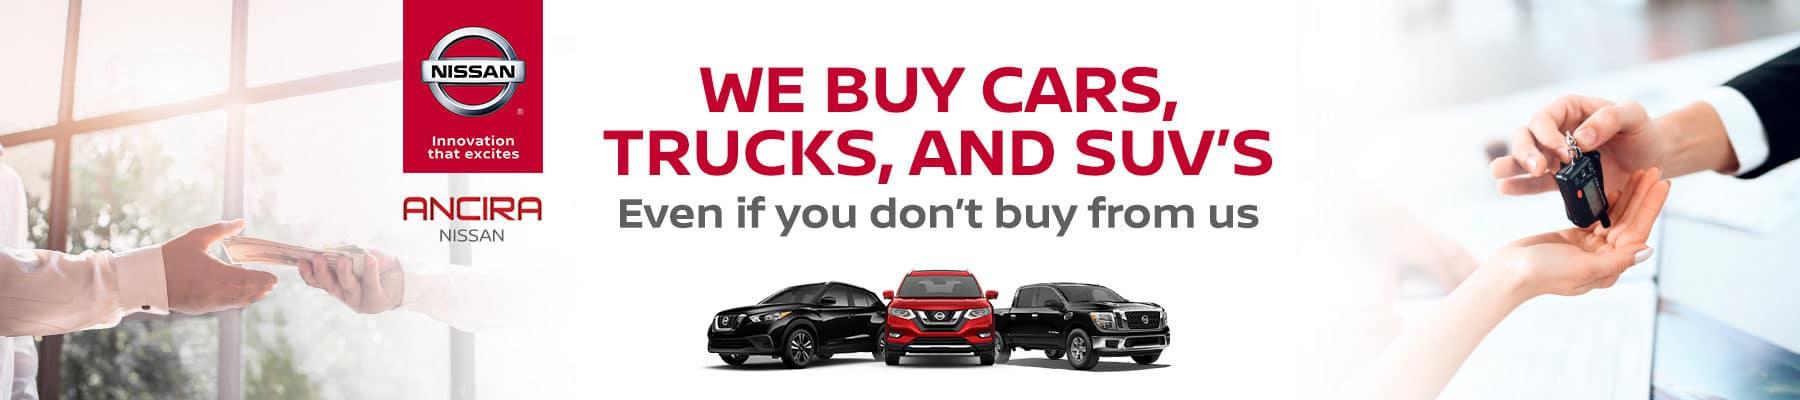 We Buy Cars and Trucks in San Antonio, TX